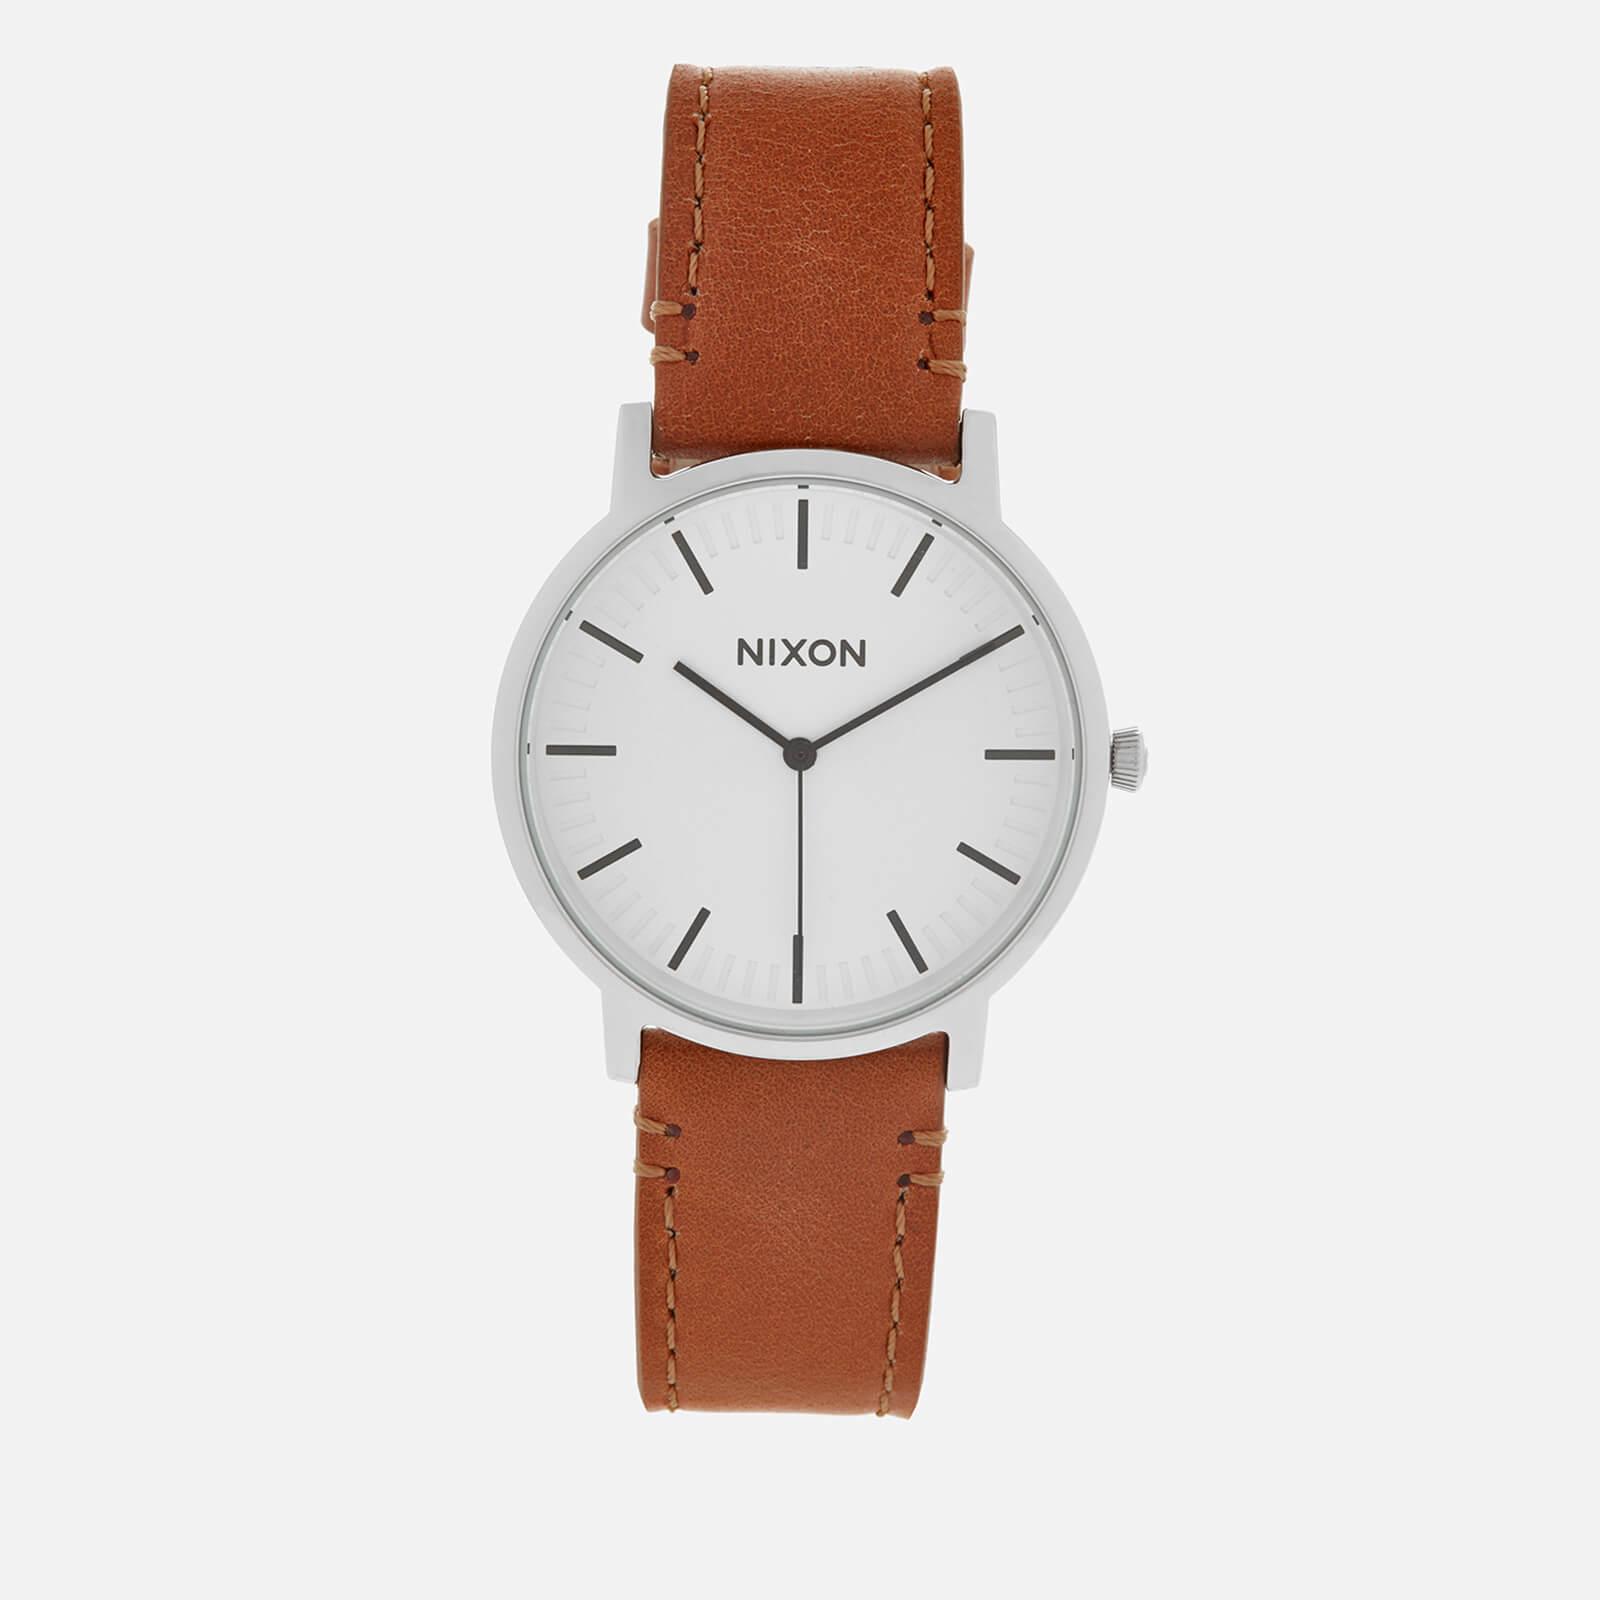 Nixon Men's The Porter Leather Watch - White Sunray/Saddle